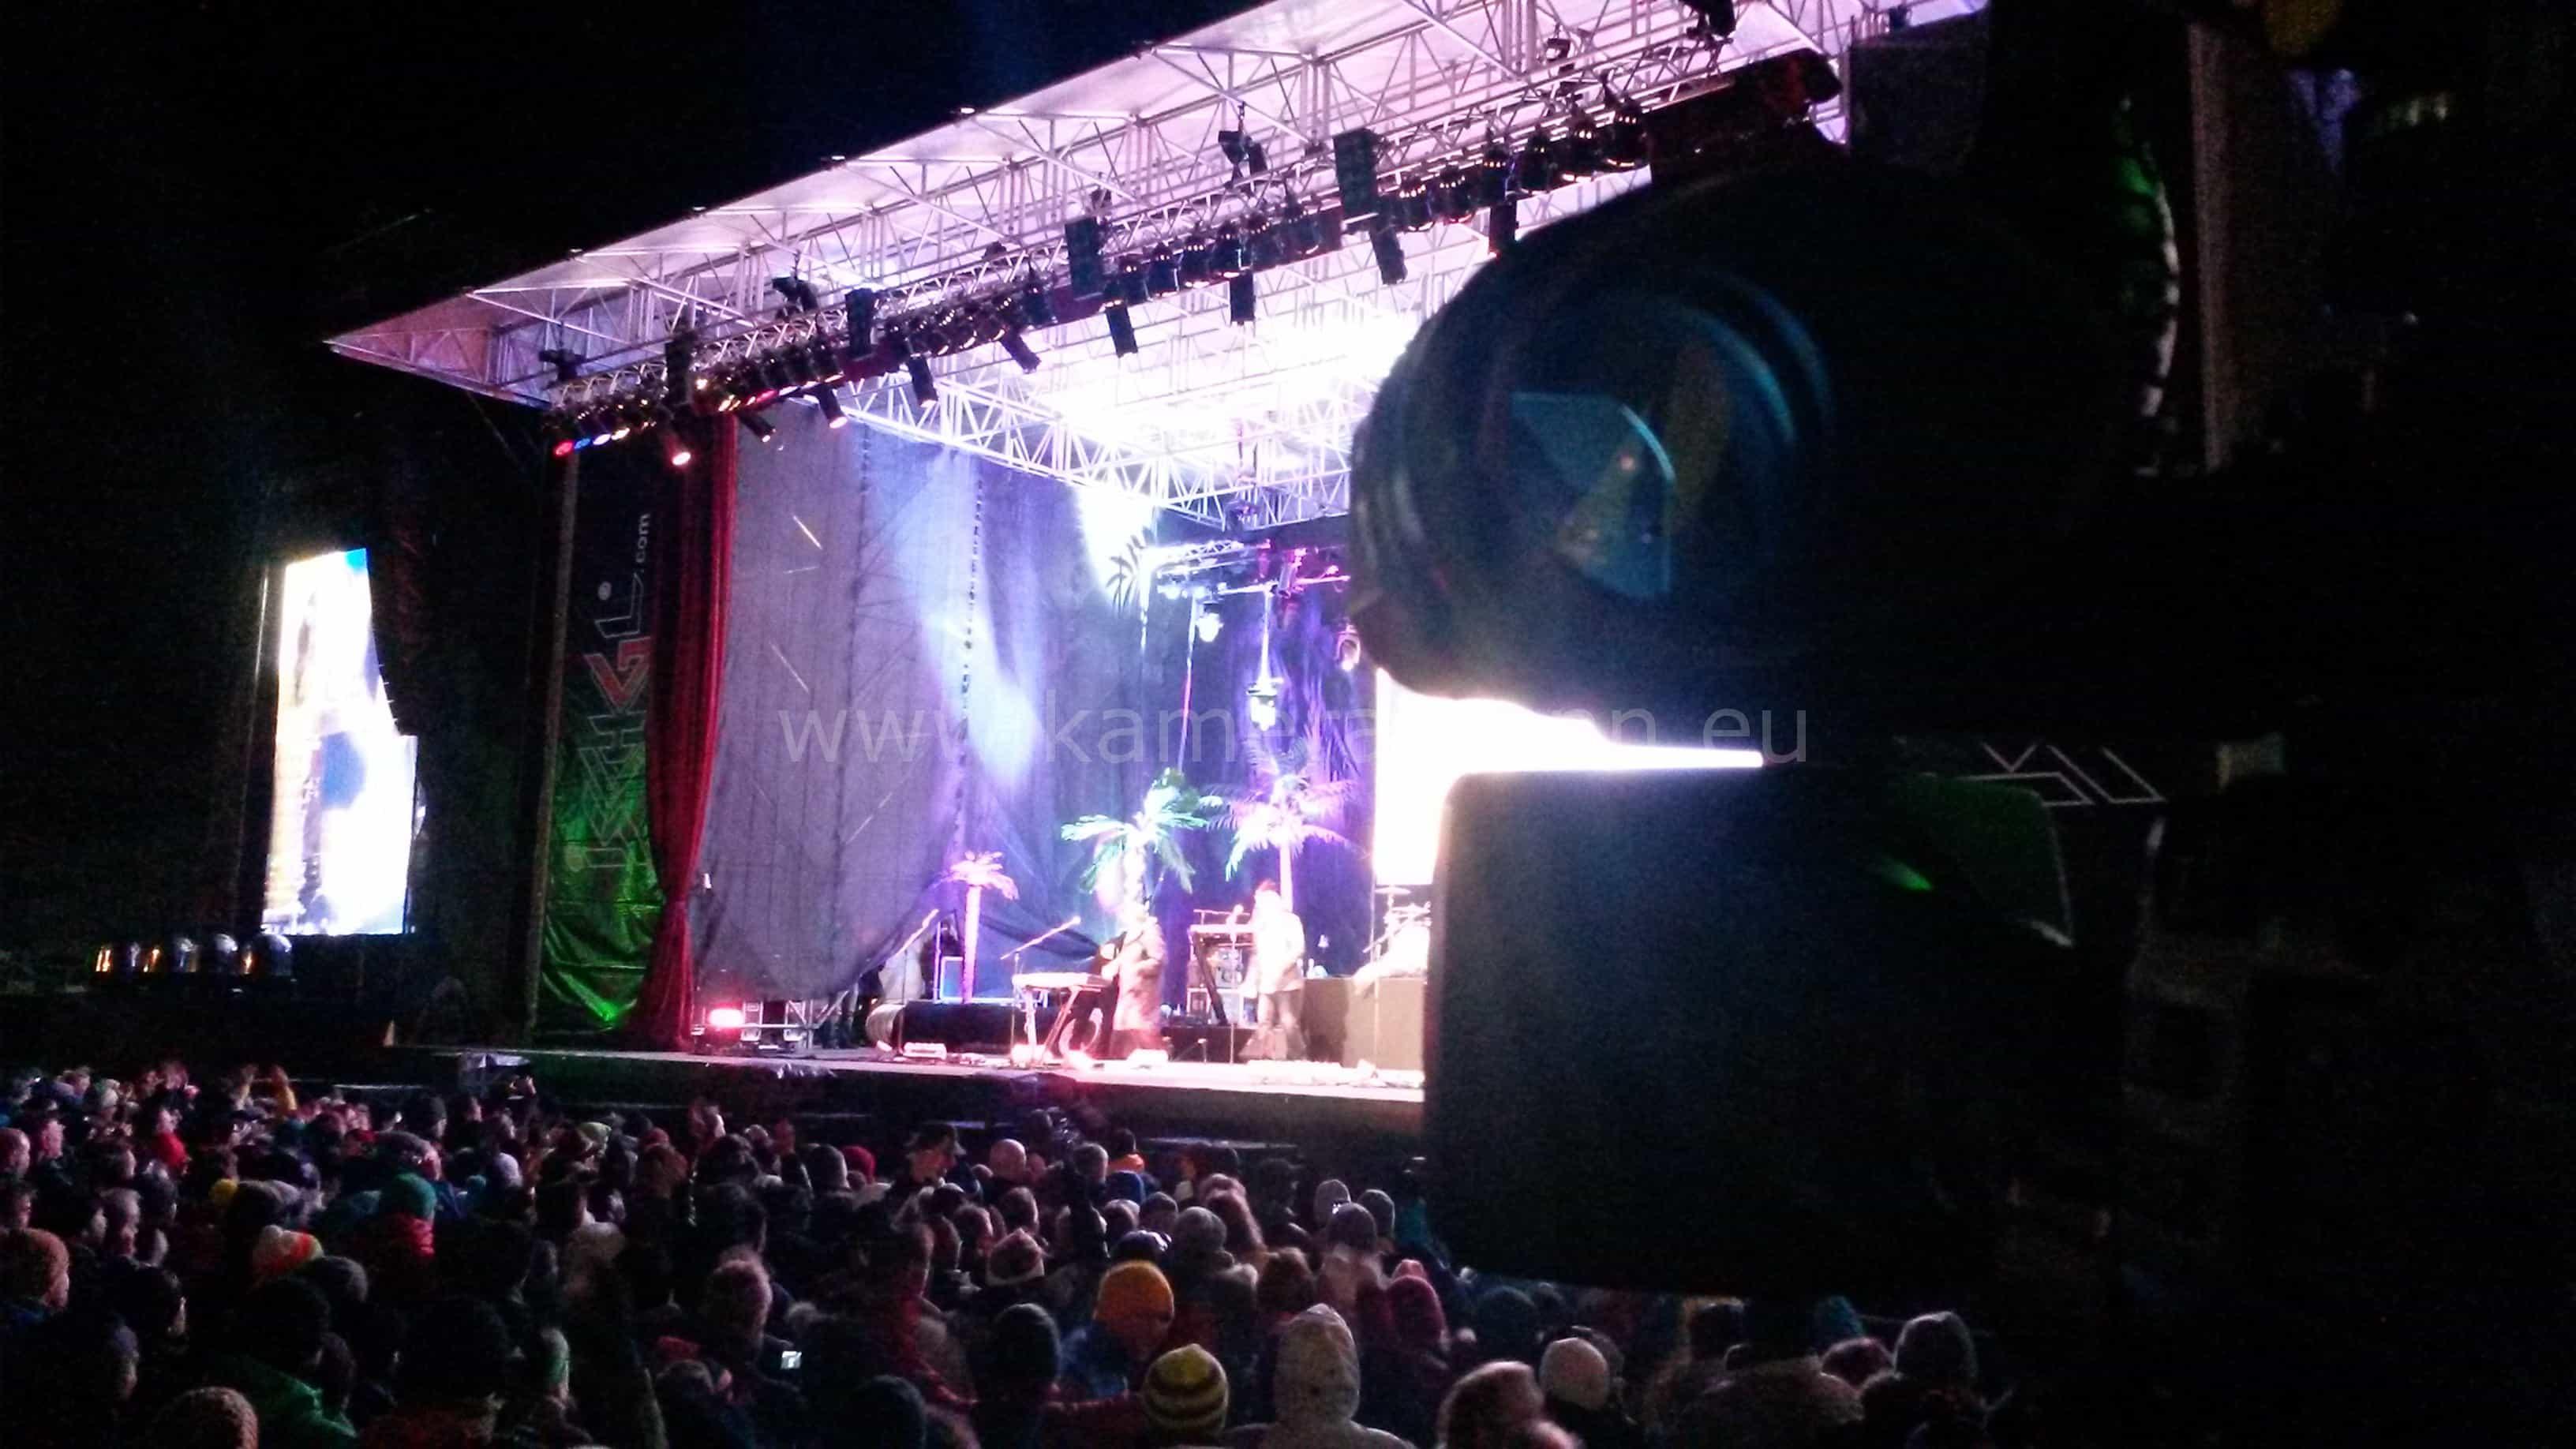 orf live 1 - ORF Live aus Ischgl